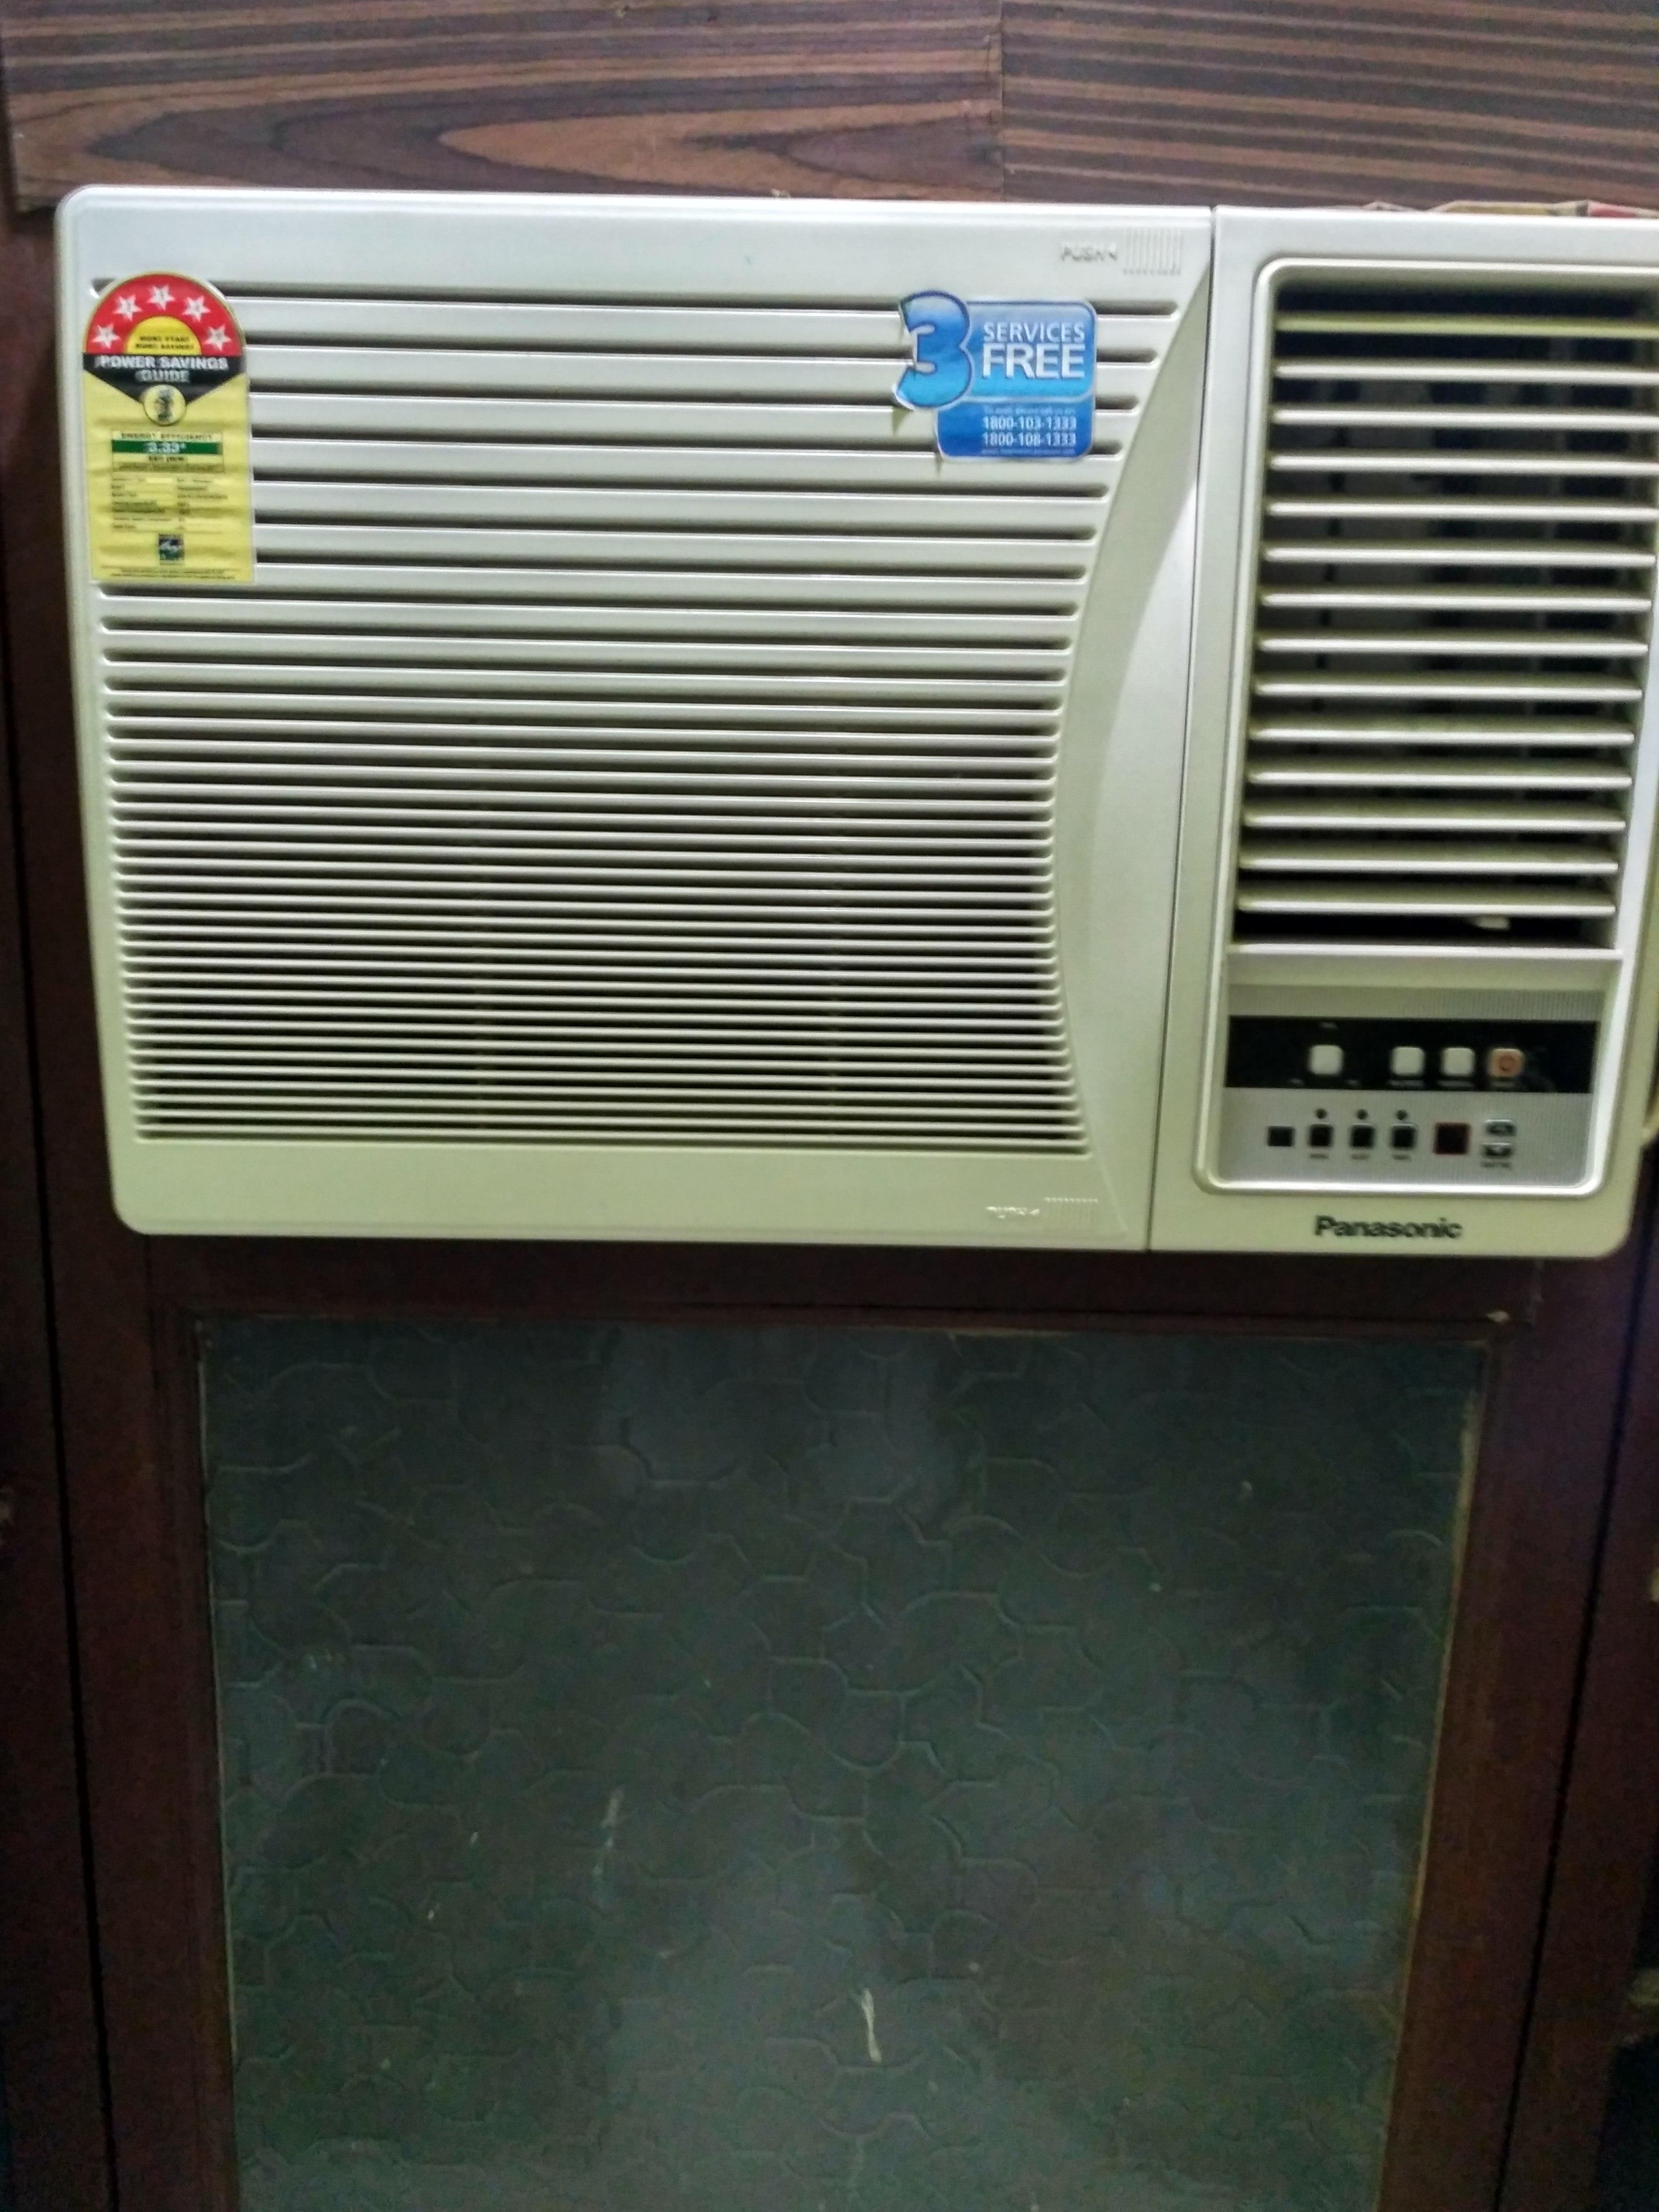 Quality of air conditioning panasonic window ac 1 5 ton for 1 5 window ac